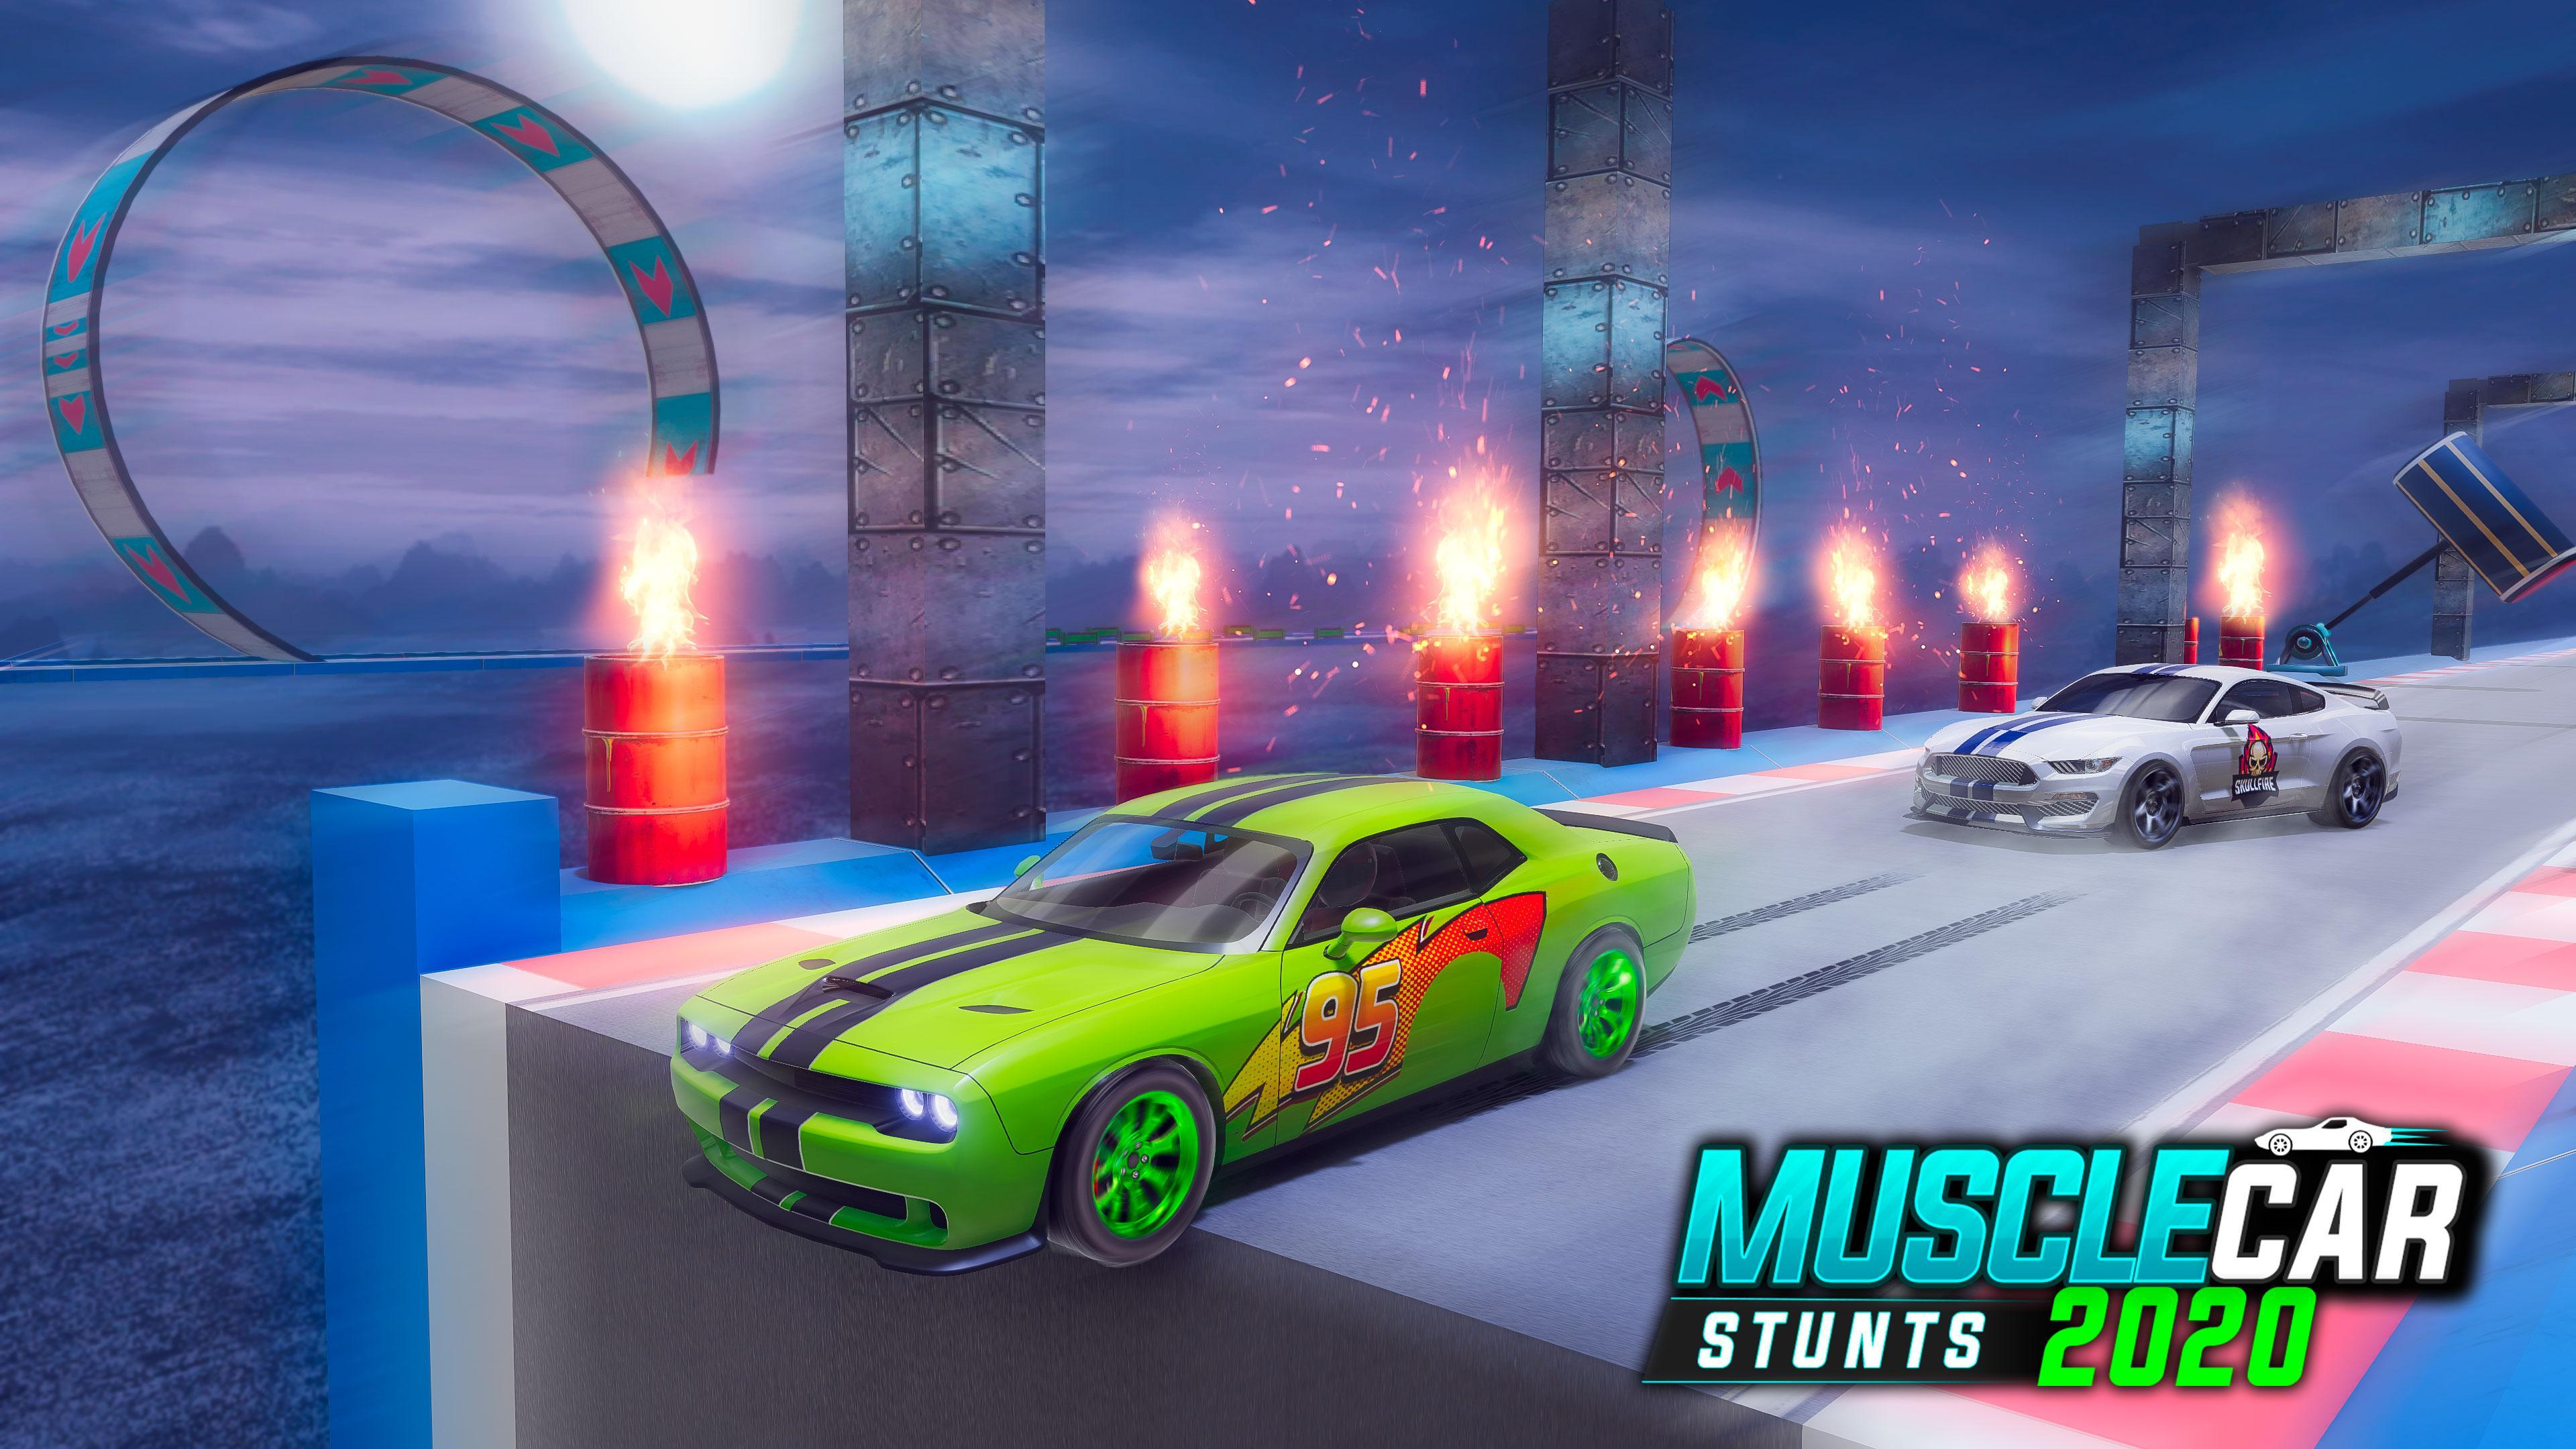 Muscle Car Stunts 2020 Mega Ramp Stunt Car Games 1.0.9 Screenshot 13